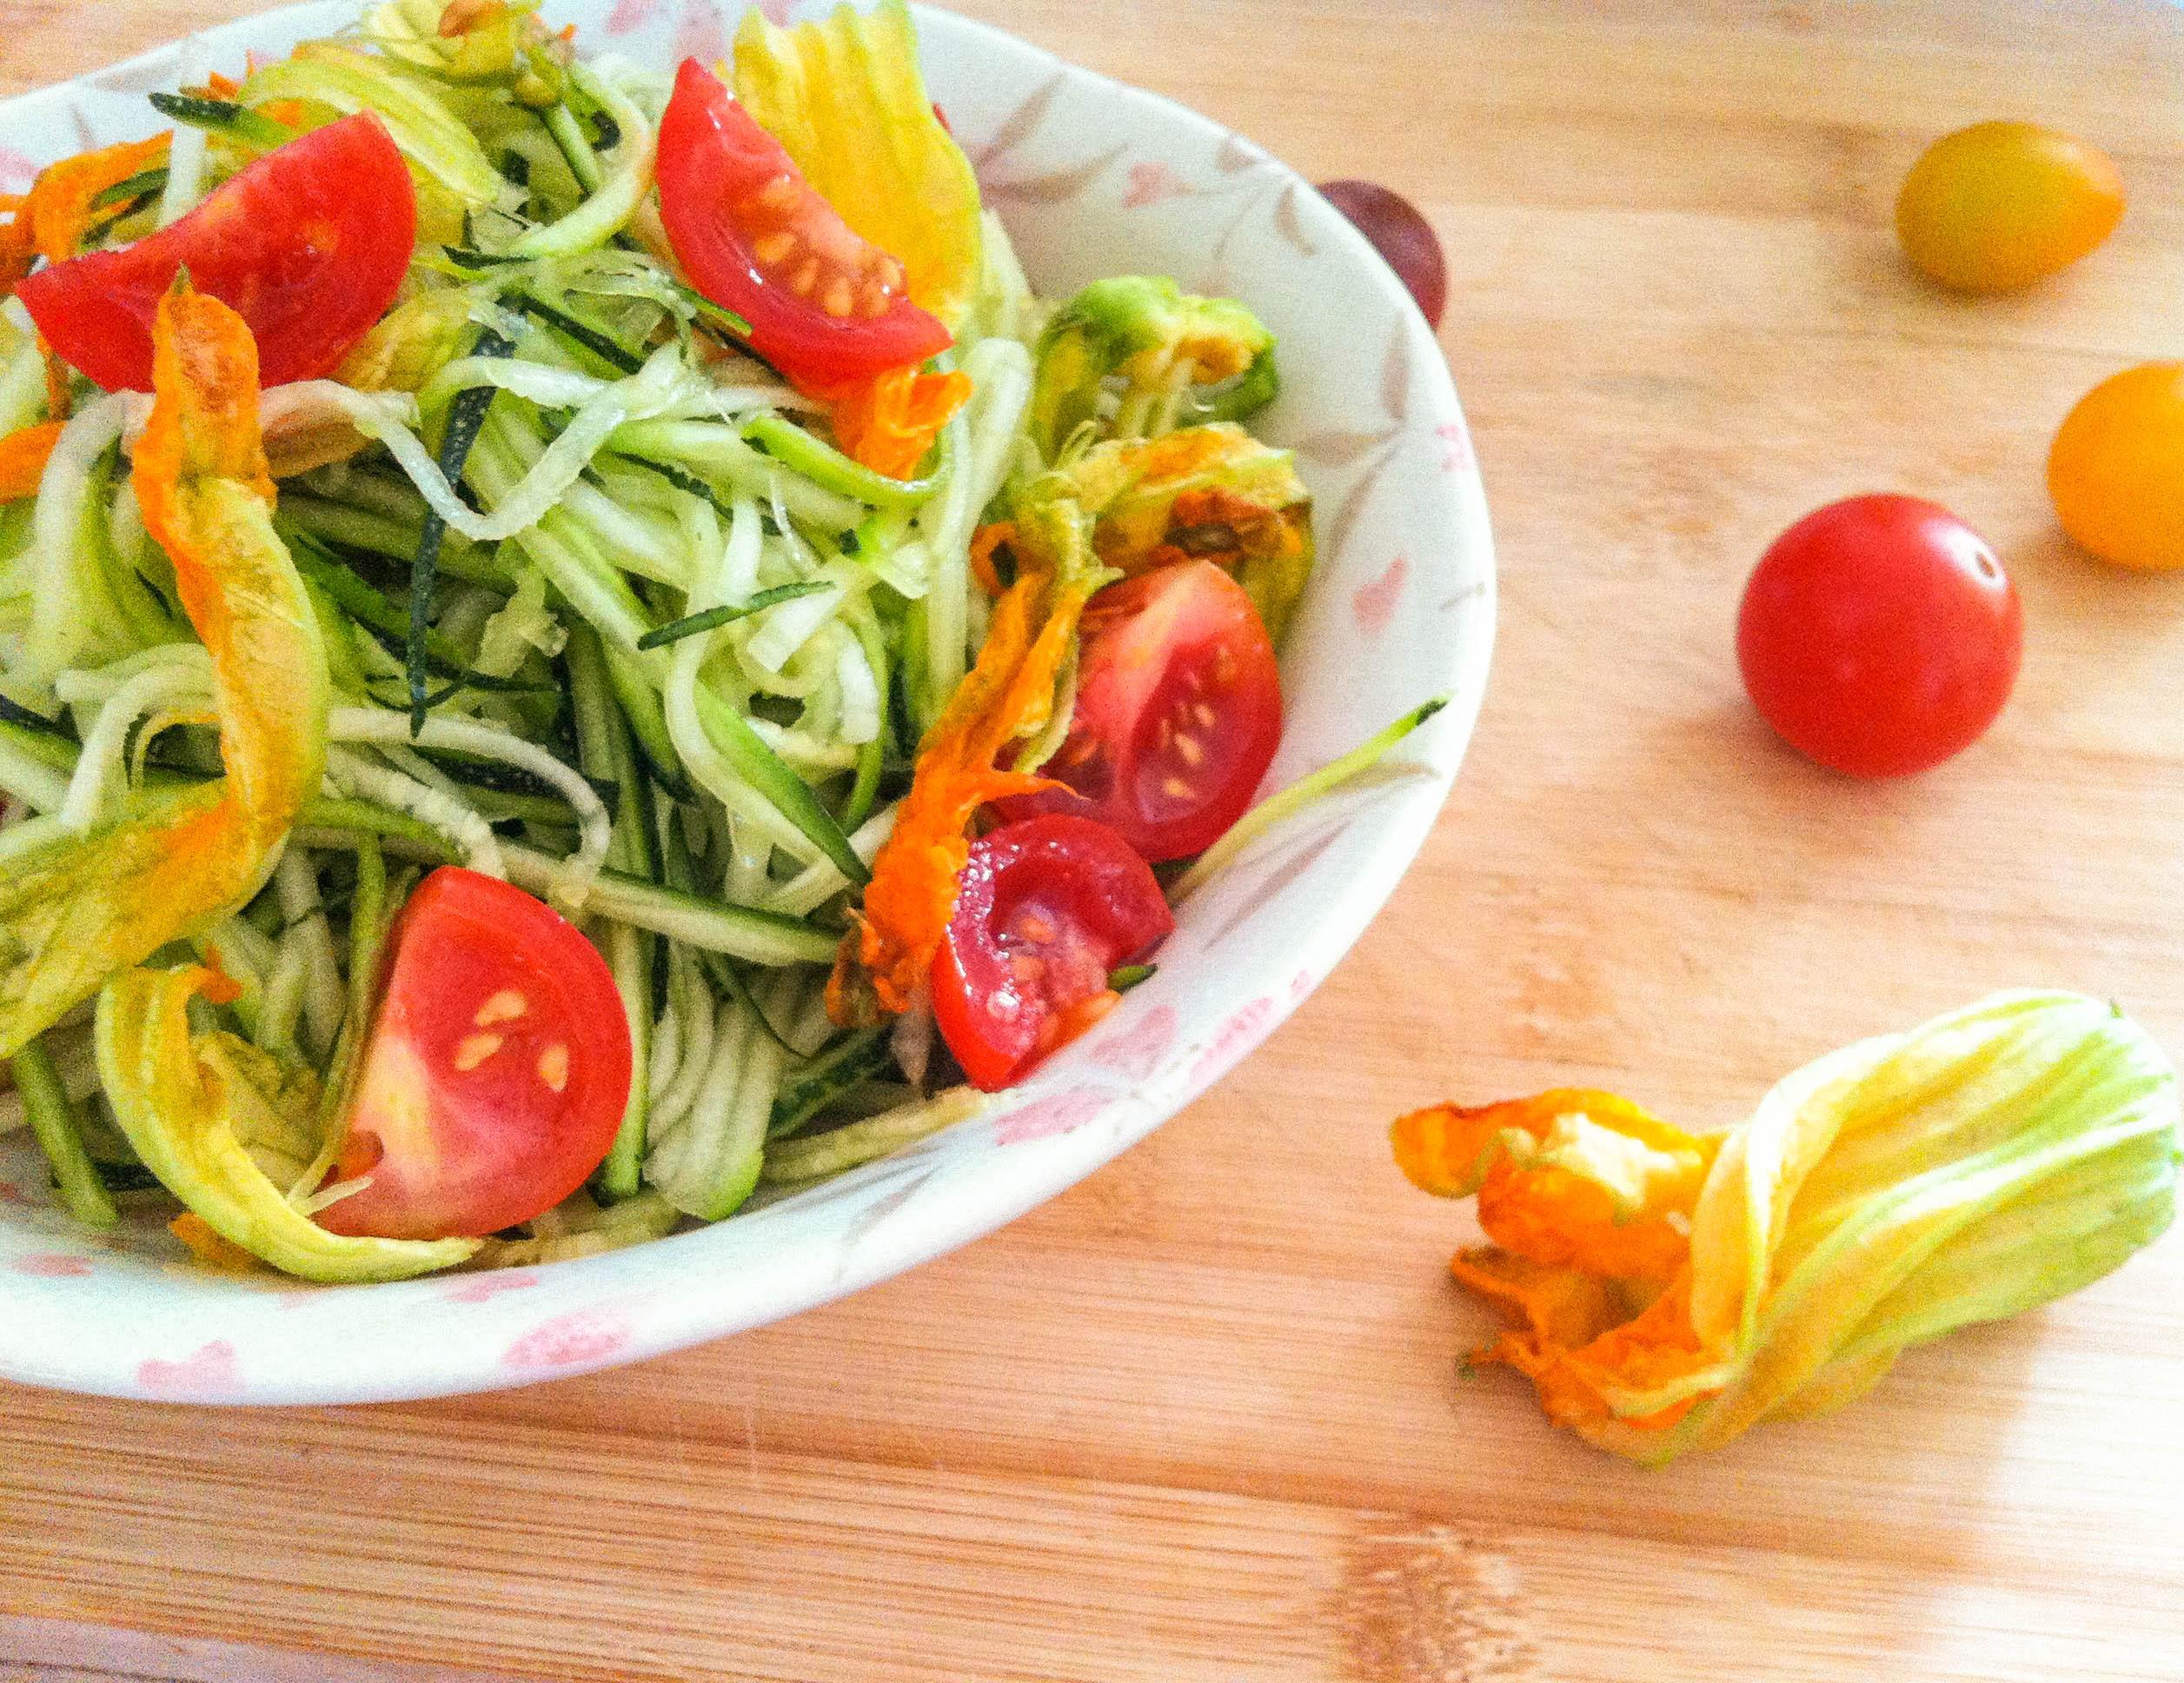 Zucchini and Squash Blossom Salad